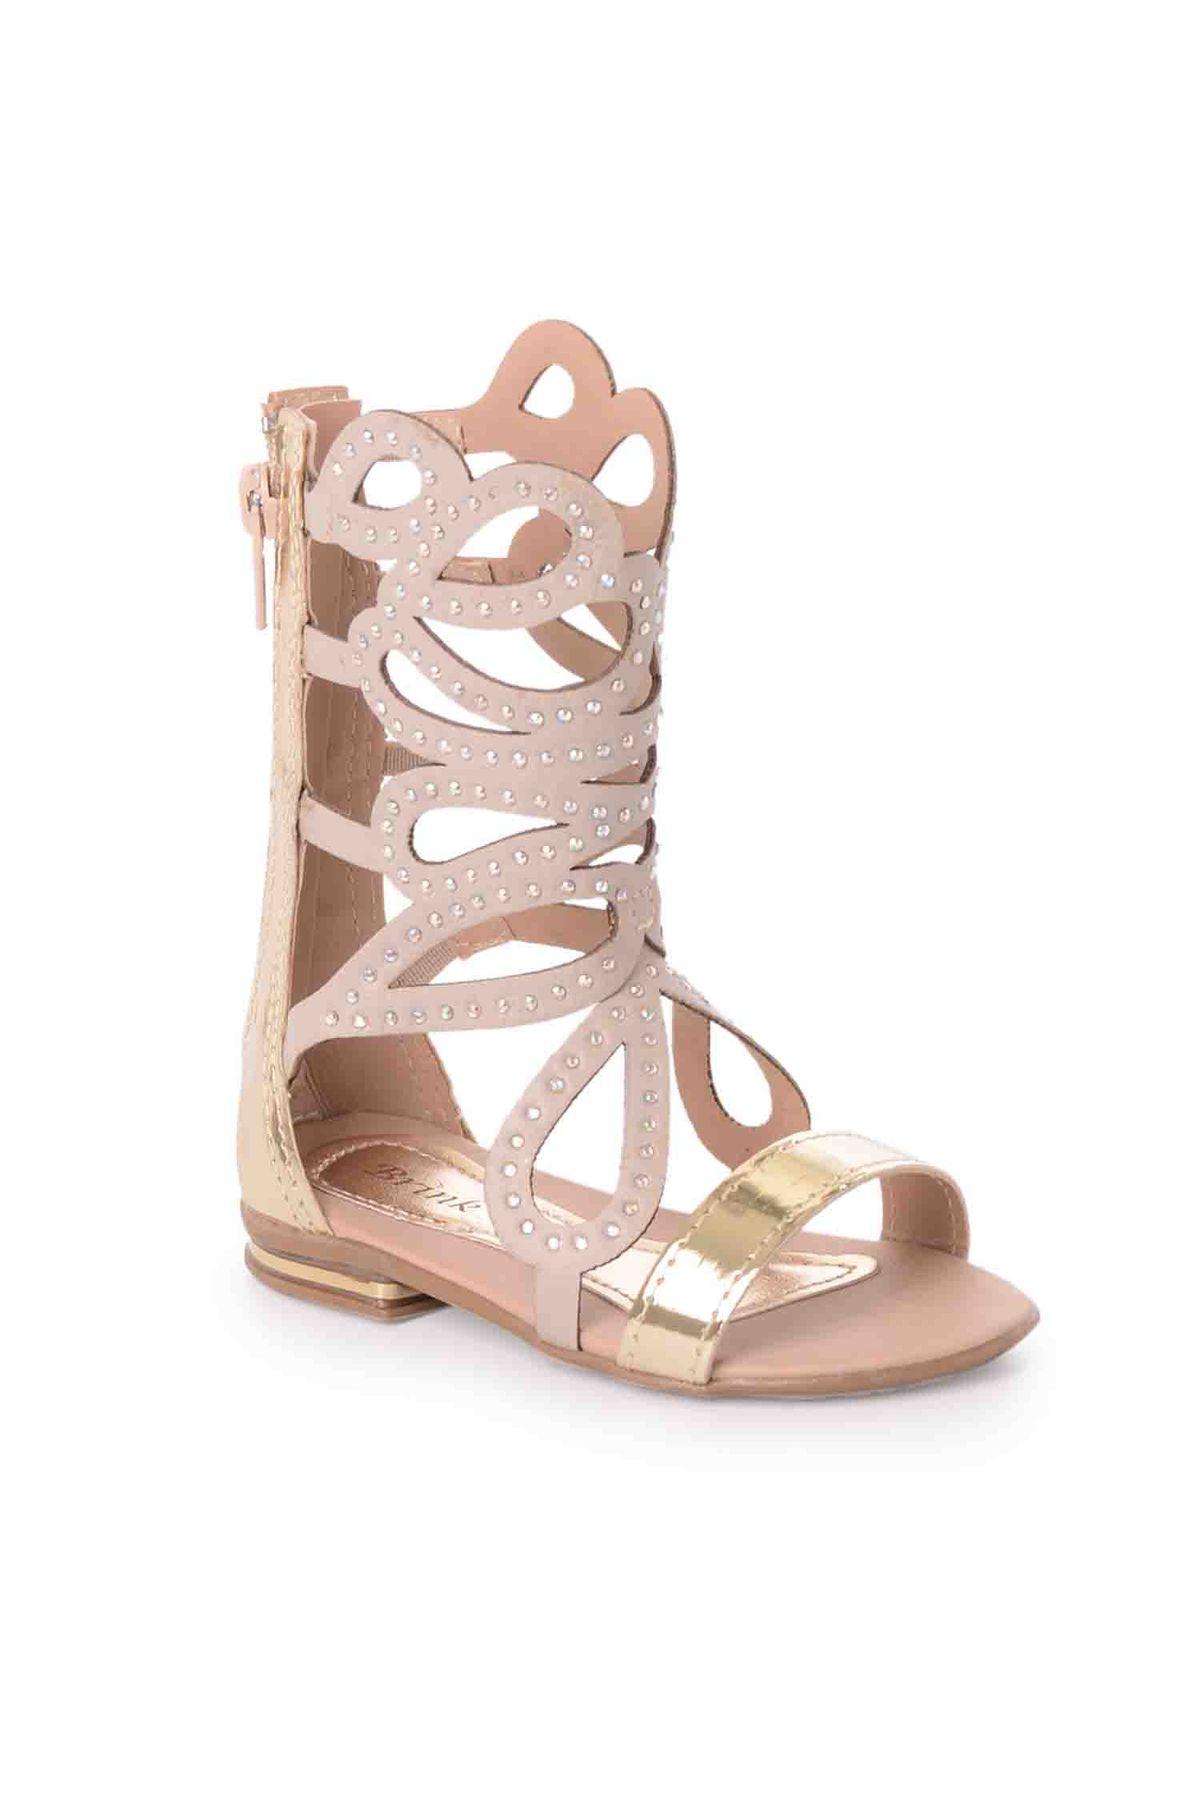 ca376d35d Sandália Infantil Brink Jull | Mundial Calçados - Mundial Calçados